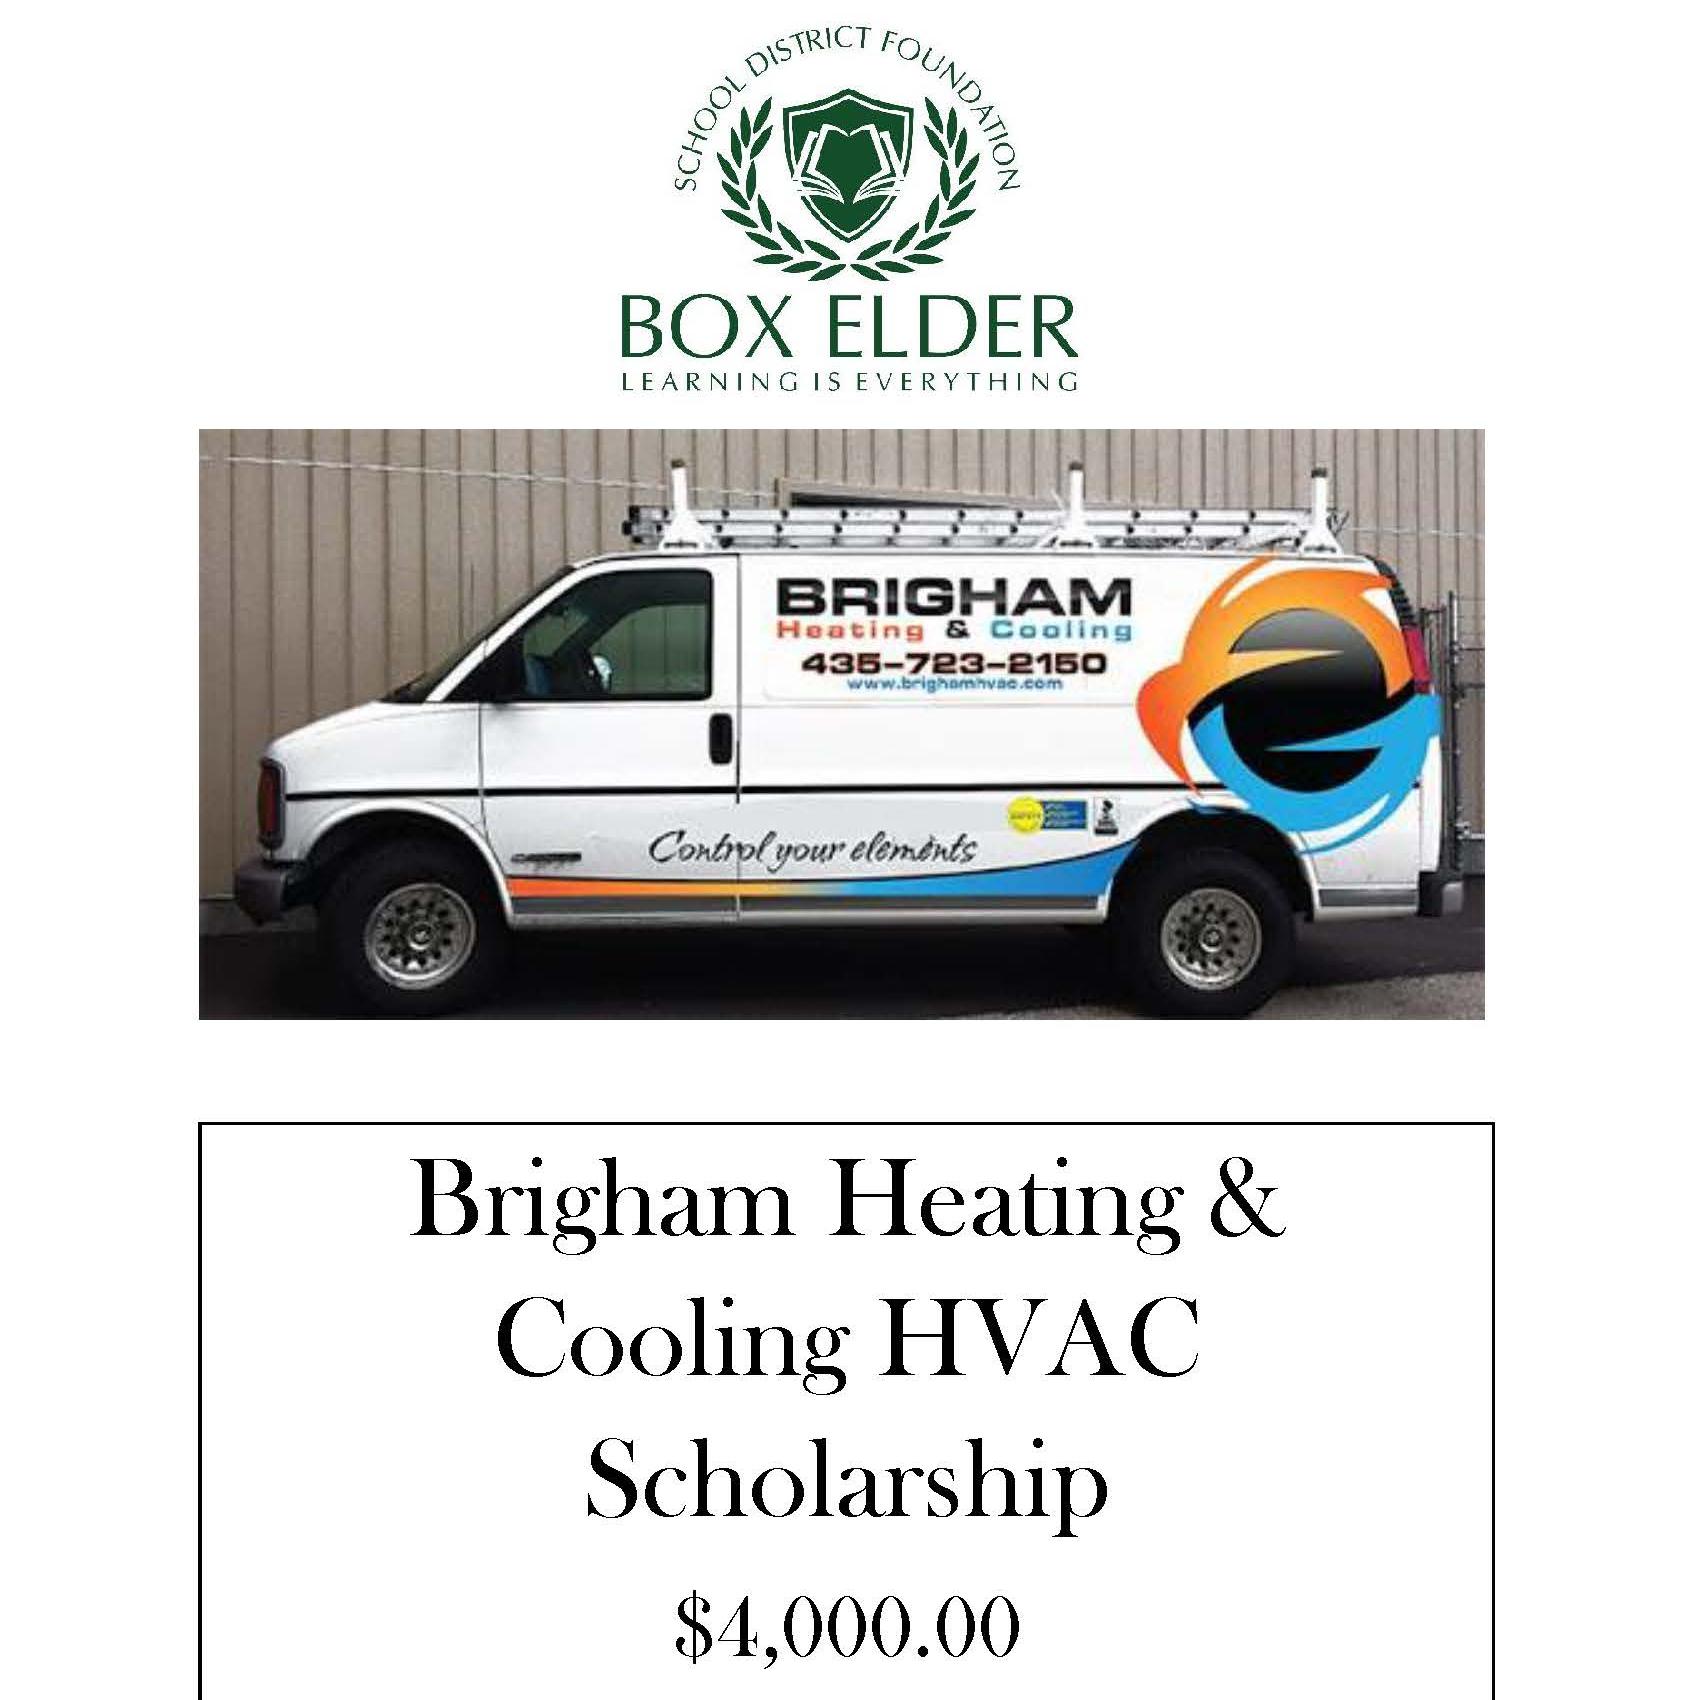 Brigham Heating & Cooling Scholarship